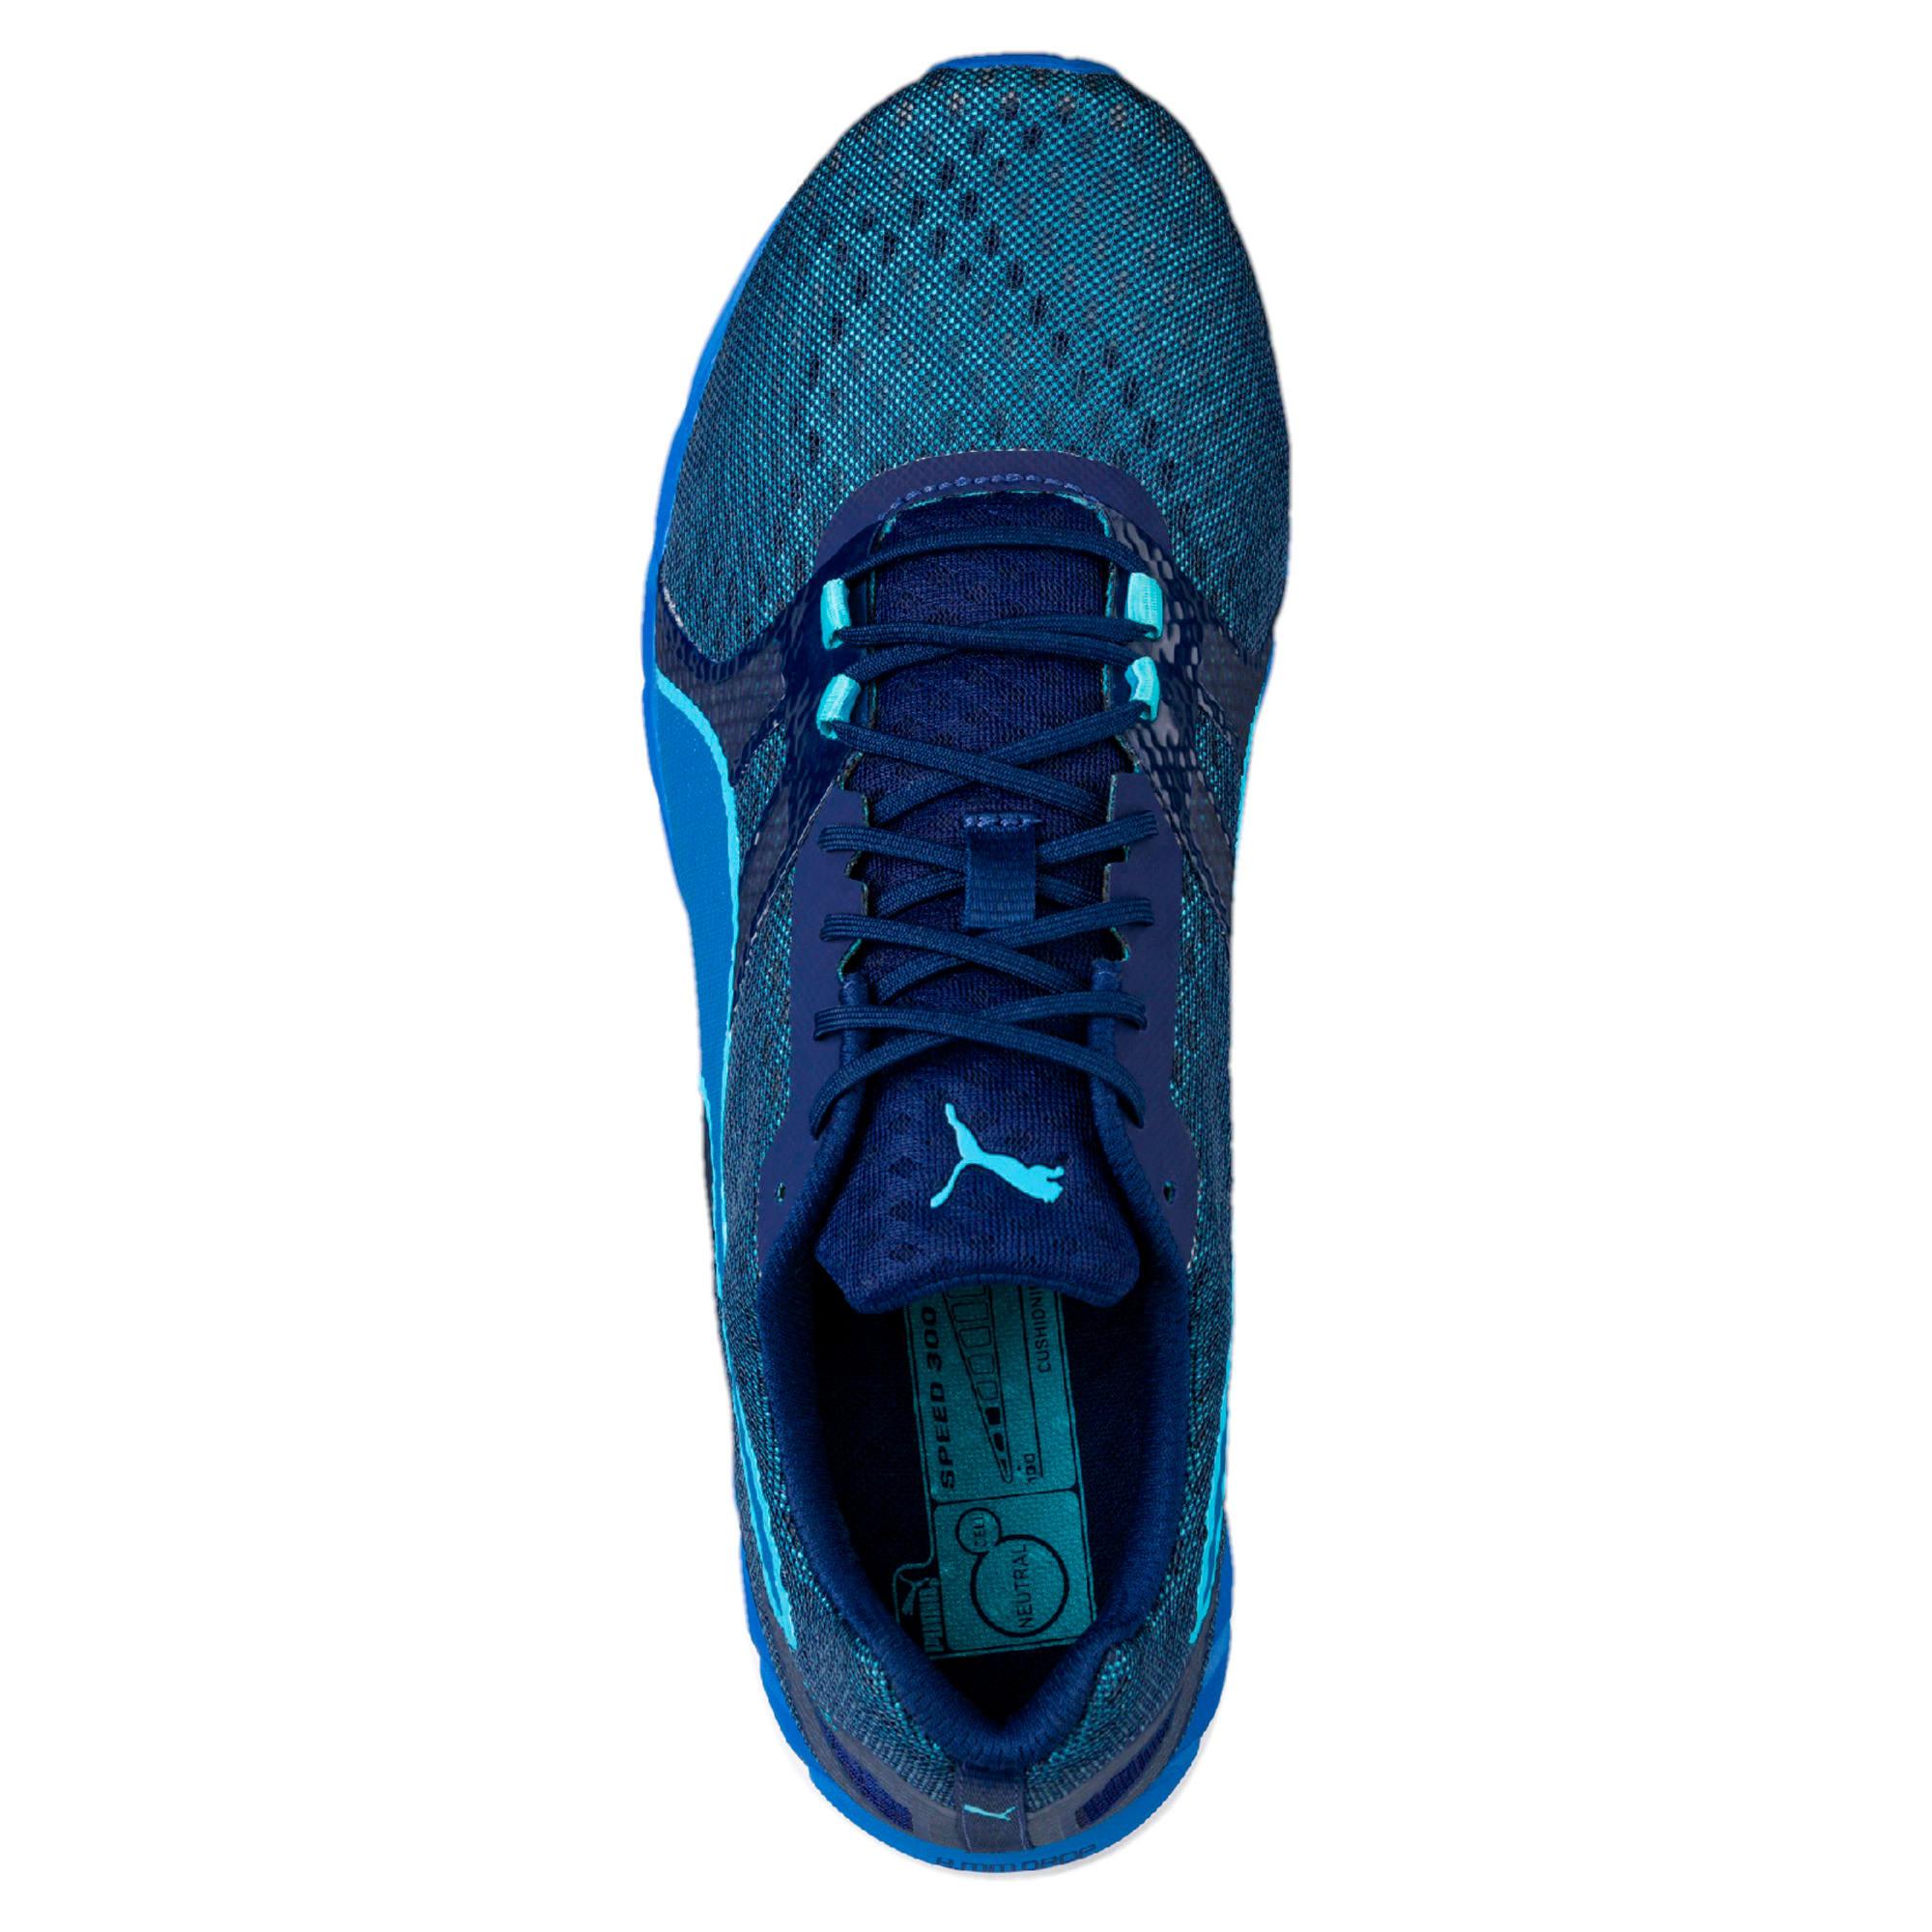 Thumbnail 4 of Speed 300 IGNITE 2 Men's Running Shoes, LapisBlue-BlueDepths-Turq, medium-IND